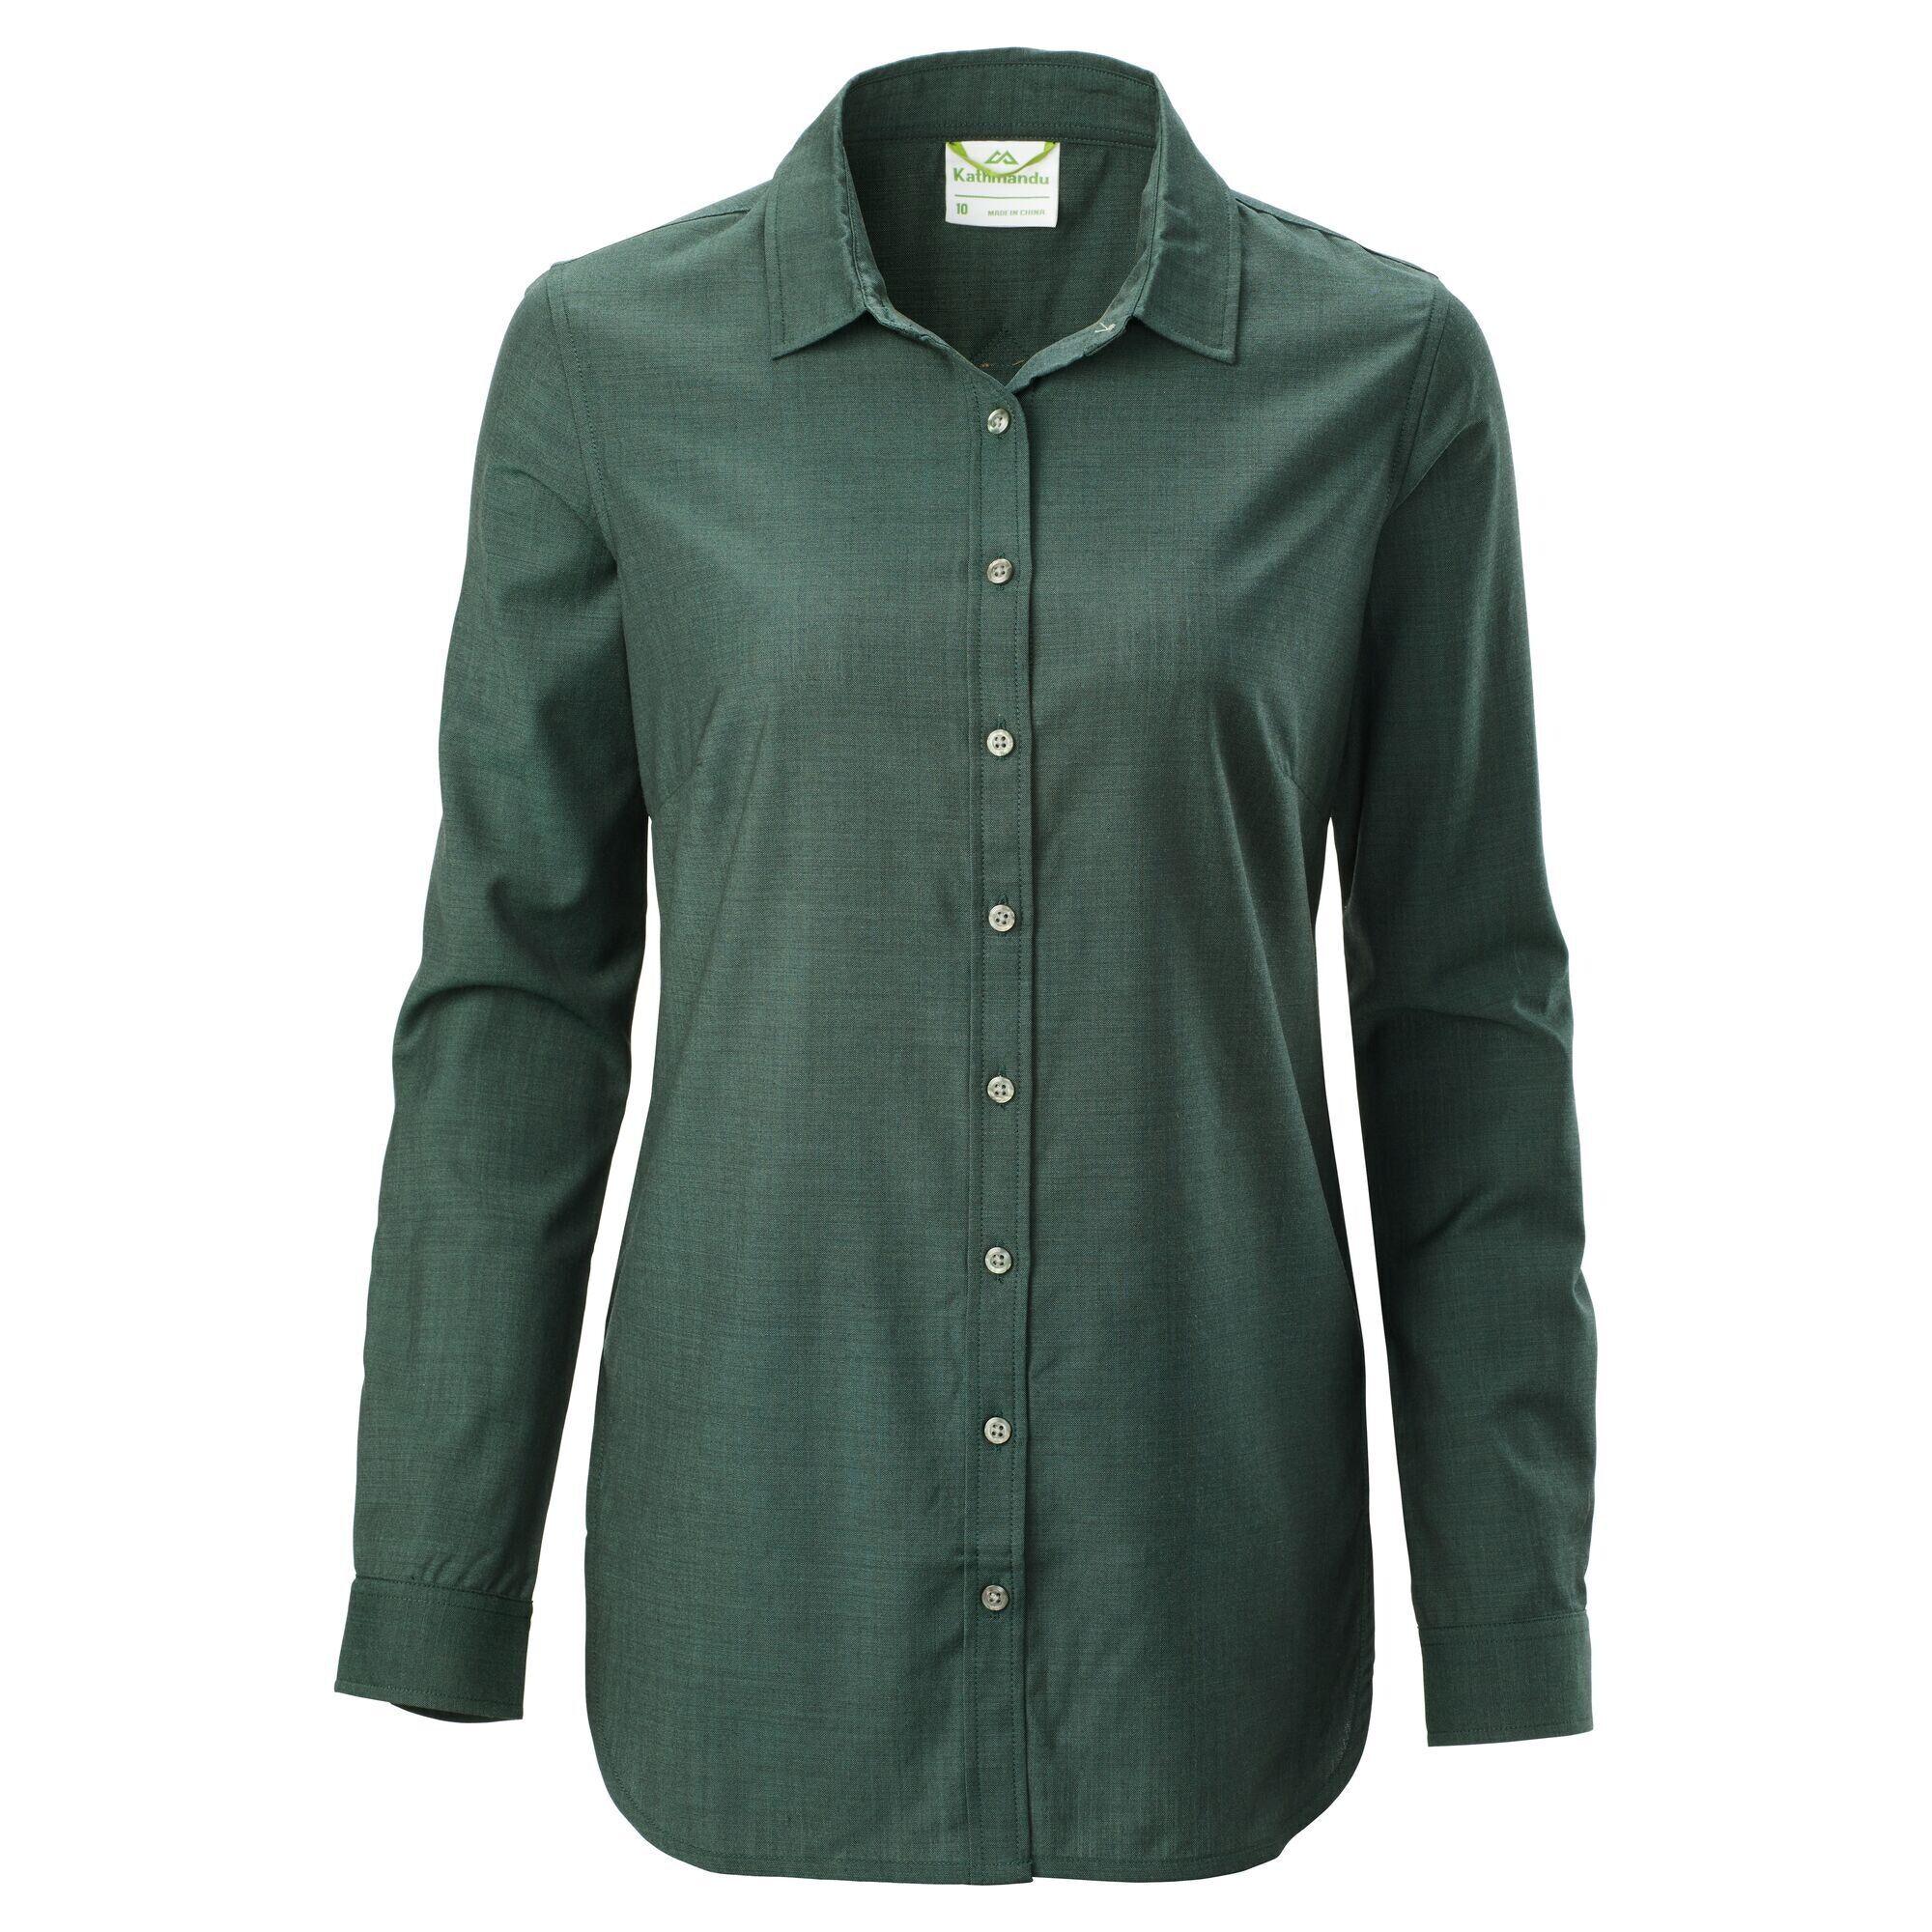 Kathmandu Tomar Women's Merino Long Sleeve Shirt  - Dark Spruce - Size: US 8